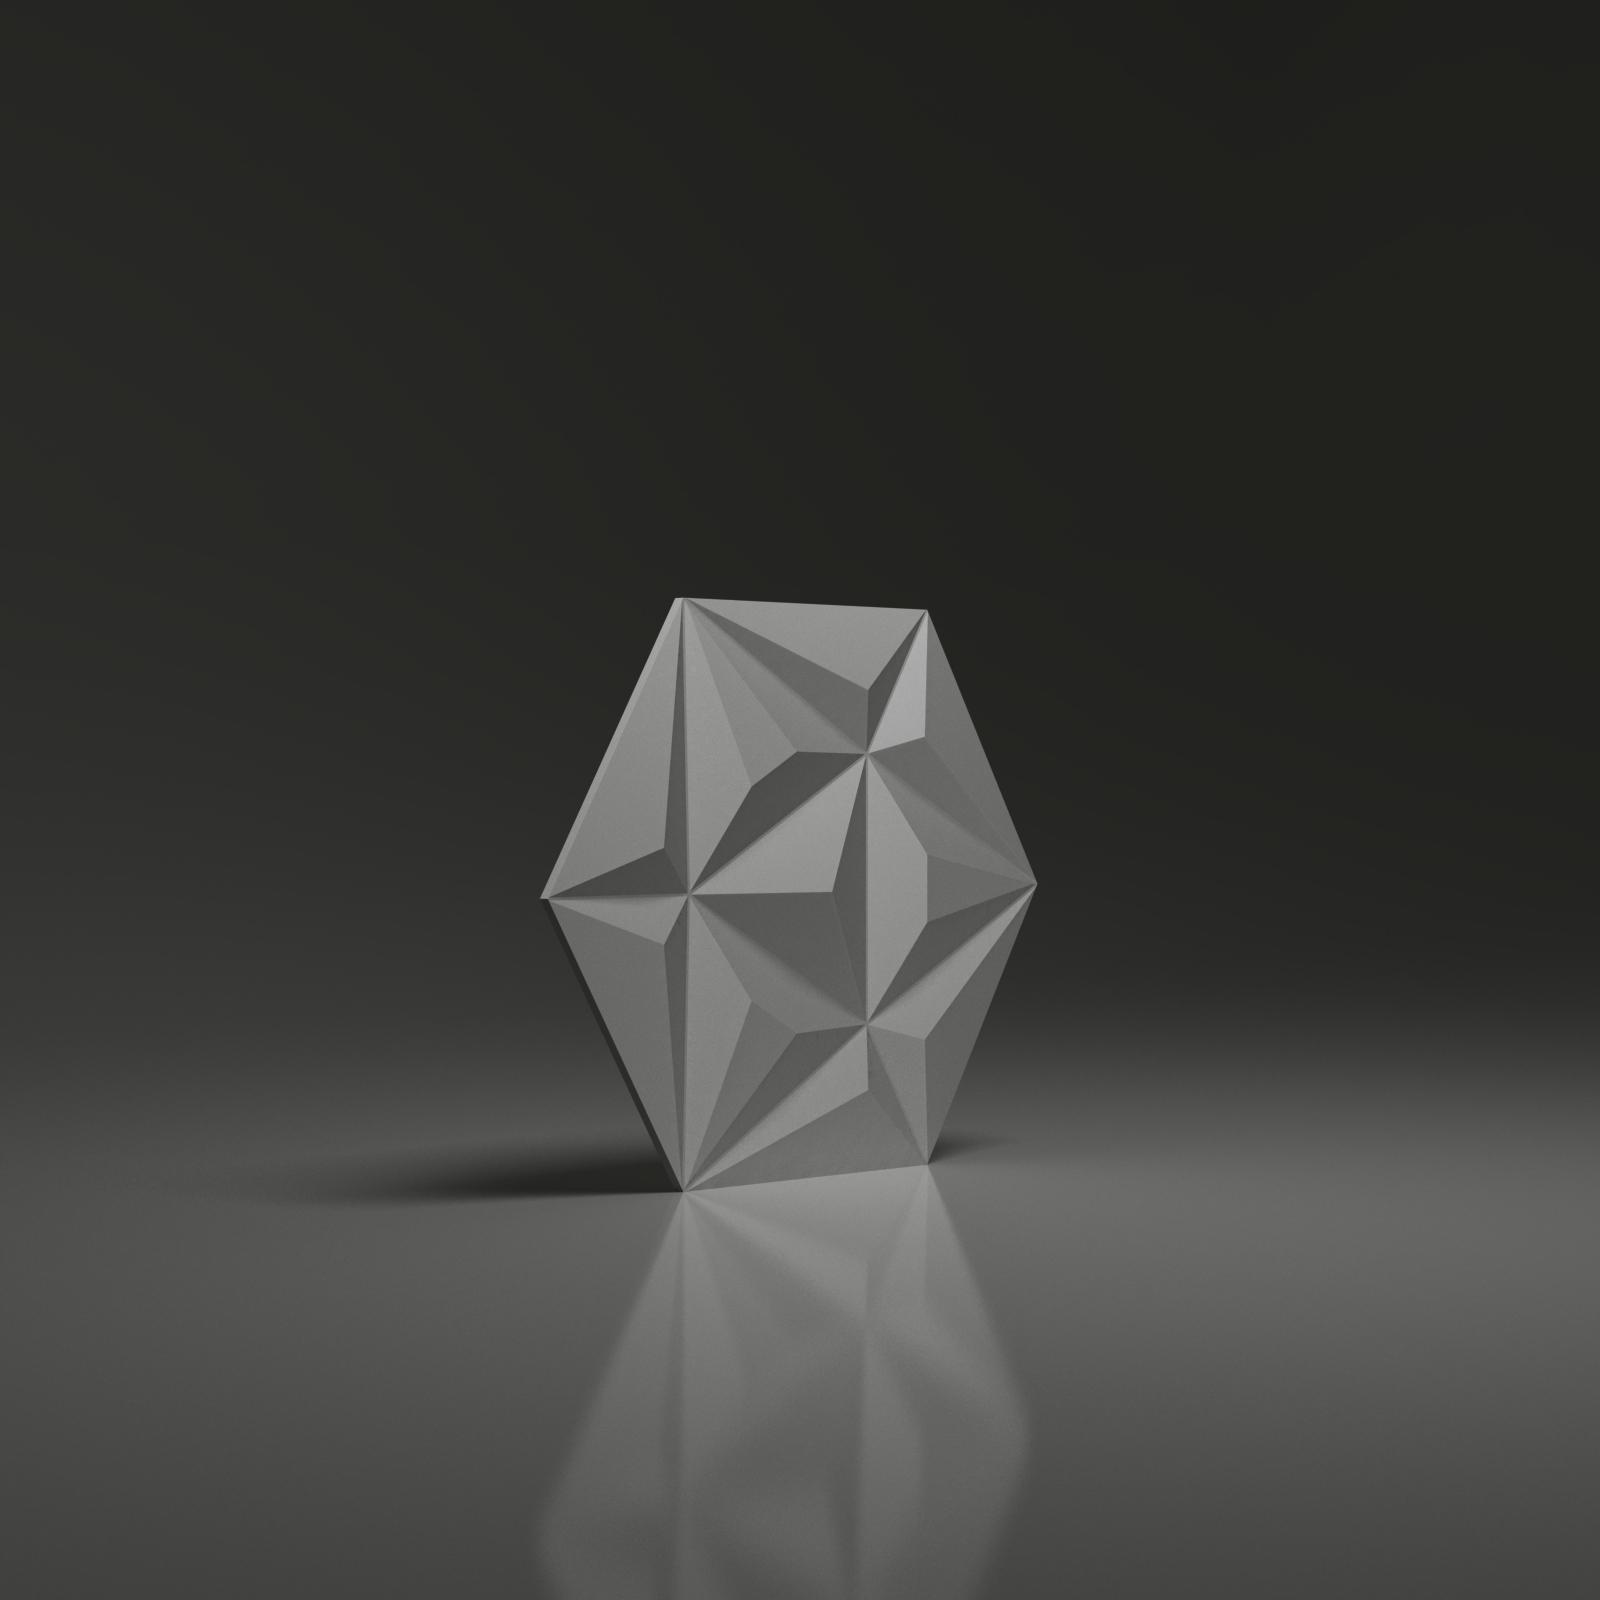 hexagon-pyramid-wizu